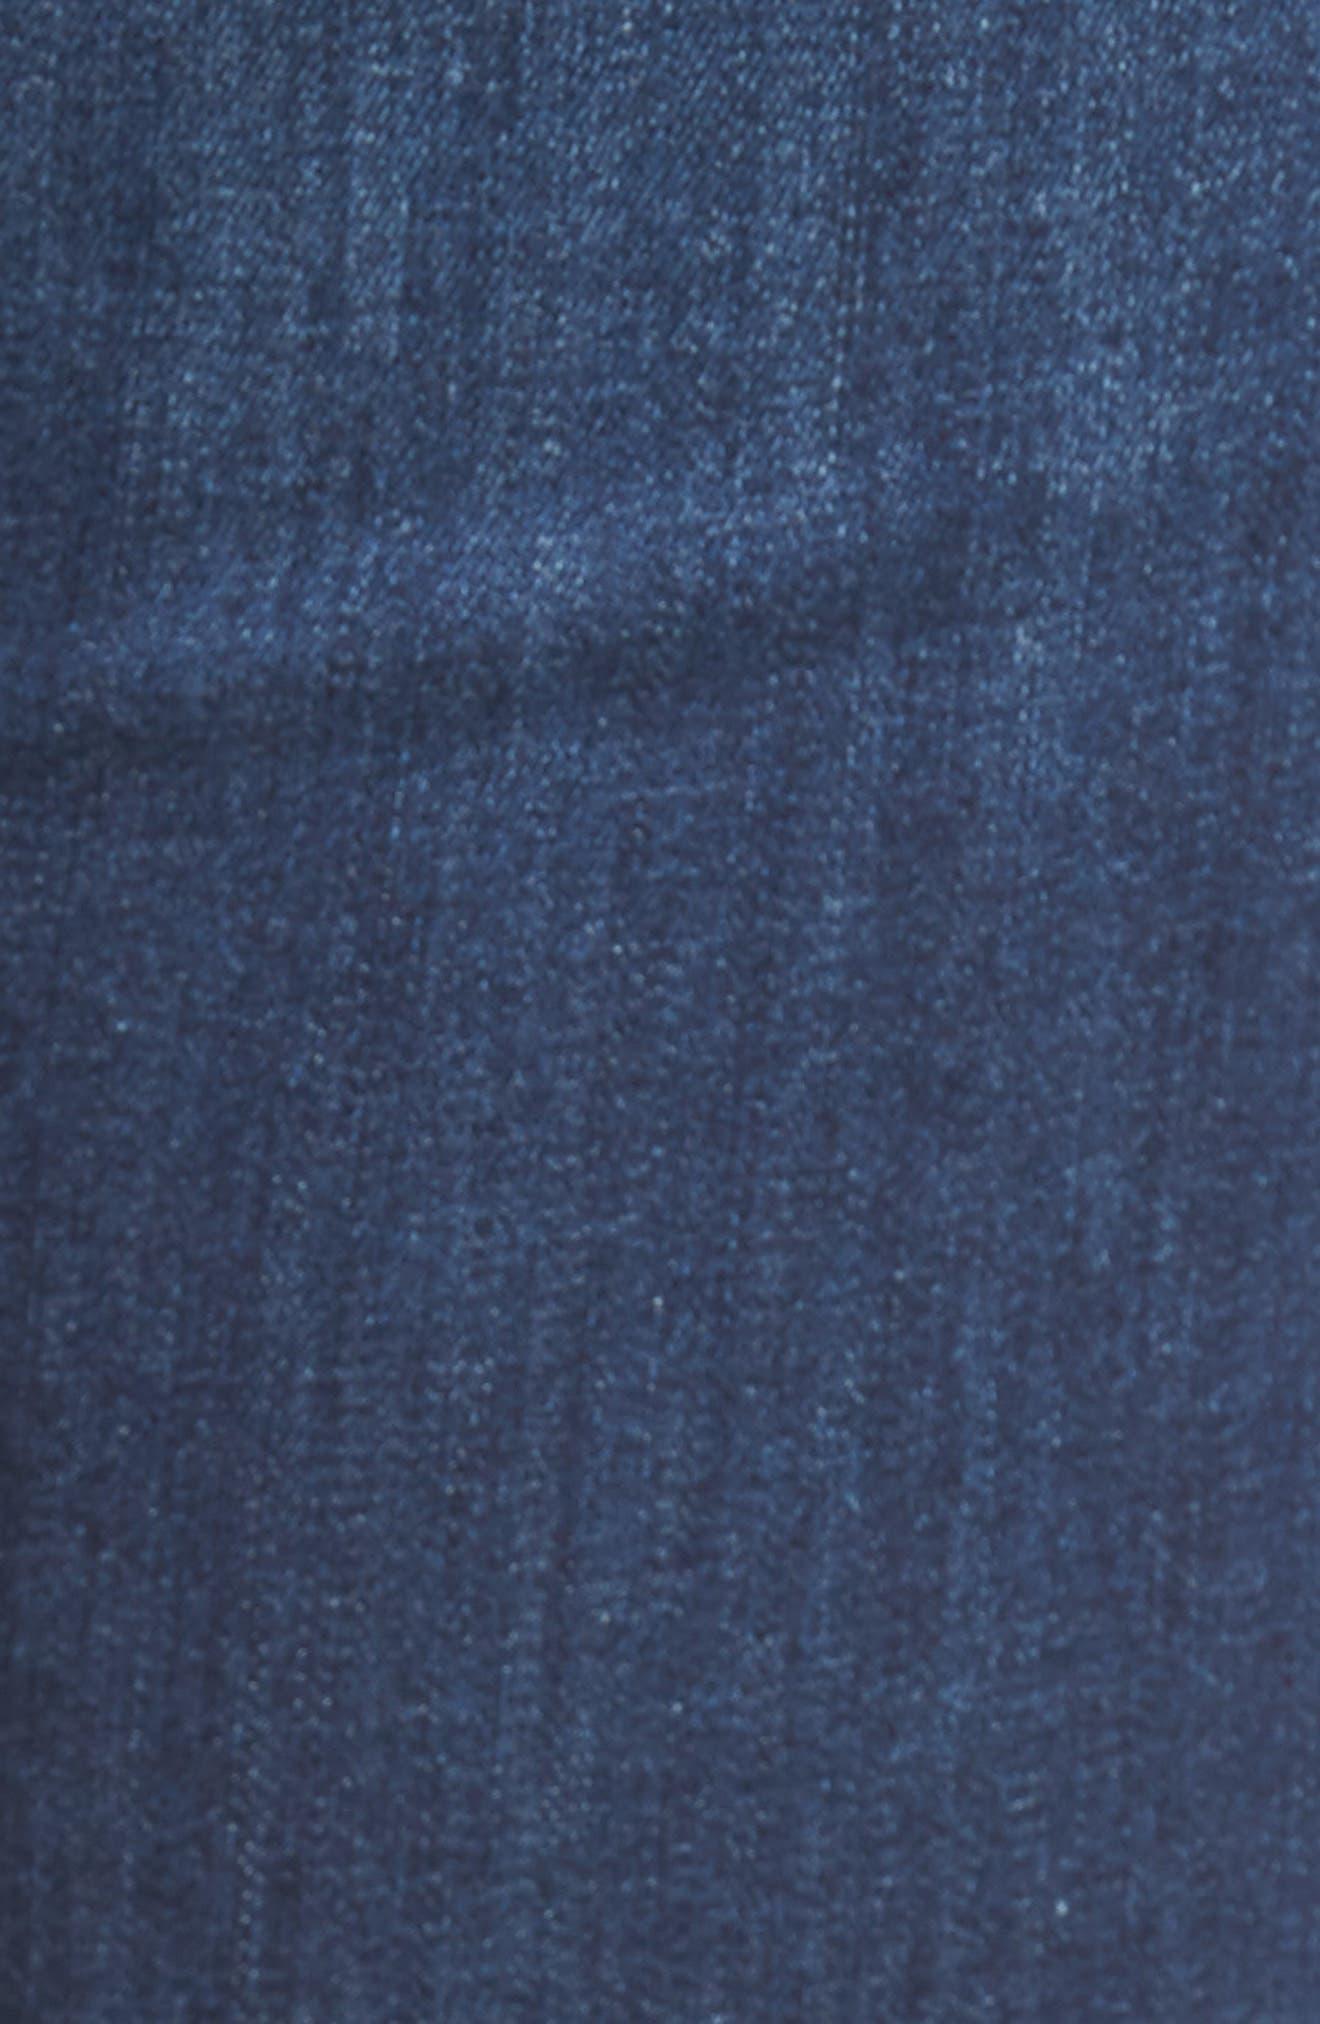 Alissa Super Skinny Jeans,                             Alternate thumbnail 5, color,                             Dark Indigo Tribeca